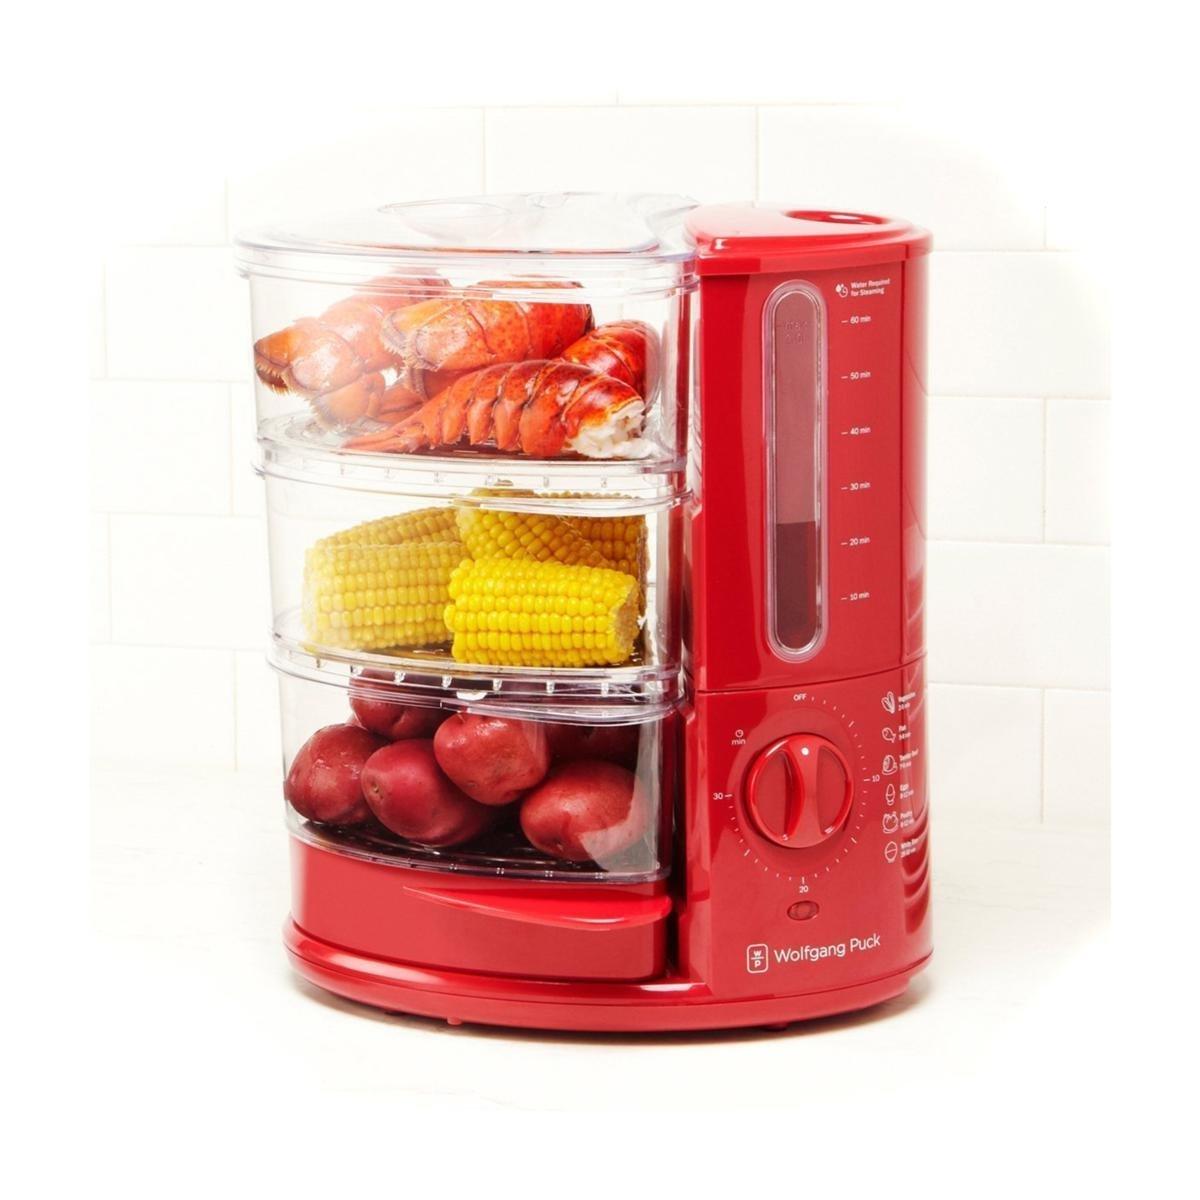 WP 3 Tier Rapid Food Steamer 1400W Red